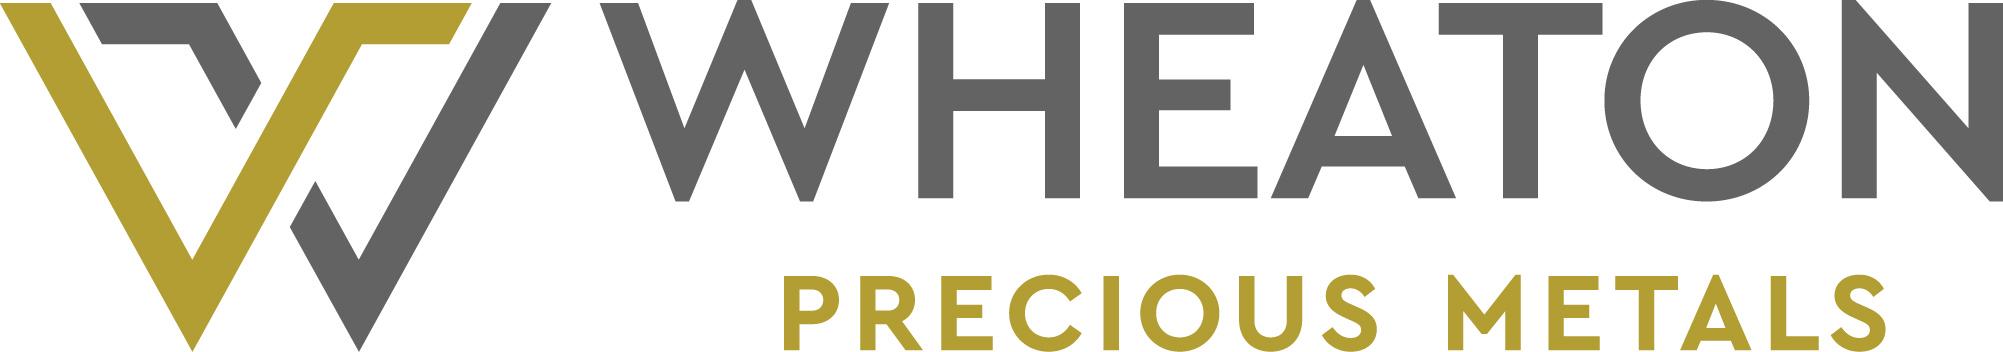 Wheaton Precious Metals Corp.